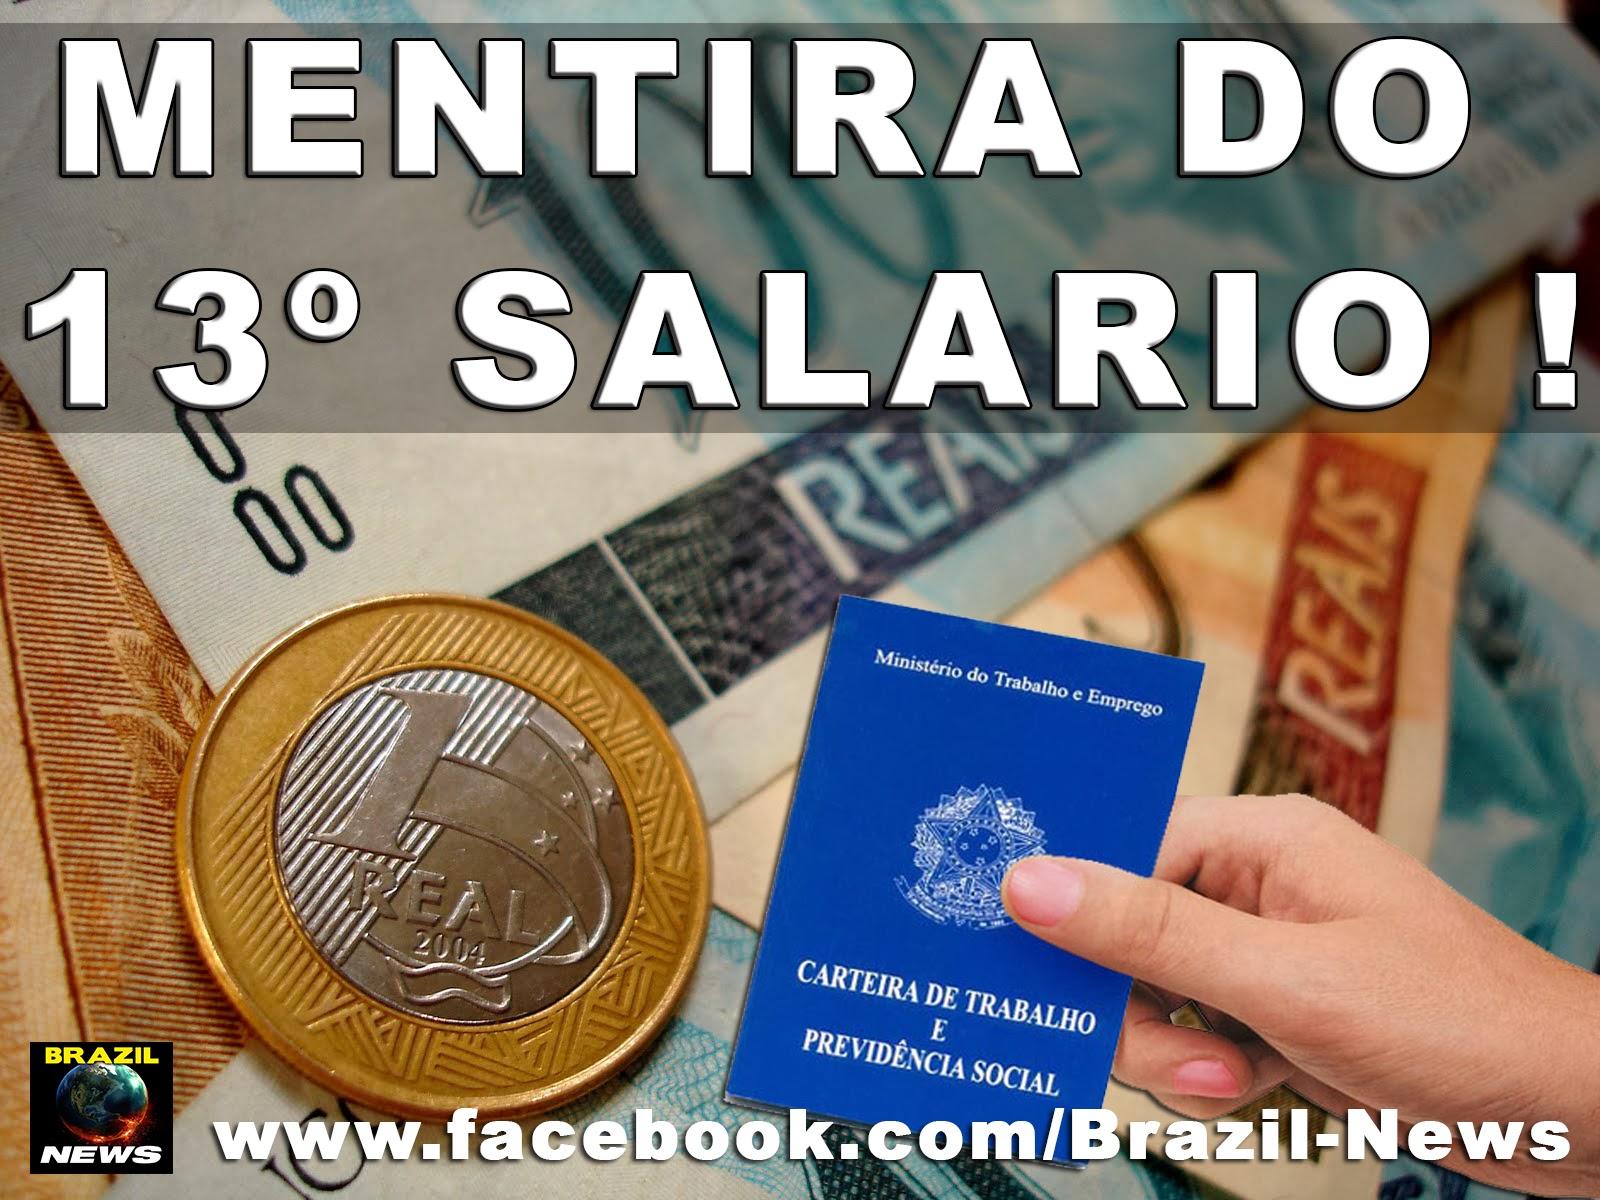 13º SALARIO, UMA MENTIRA !